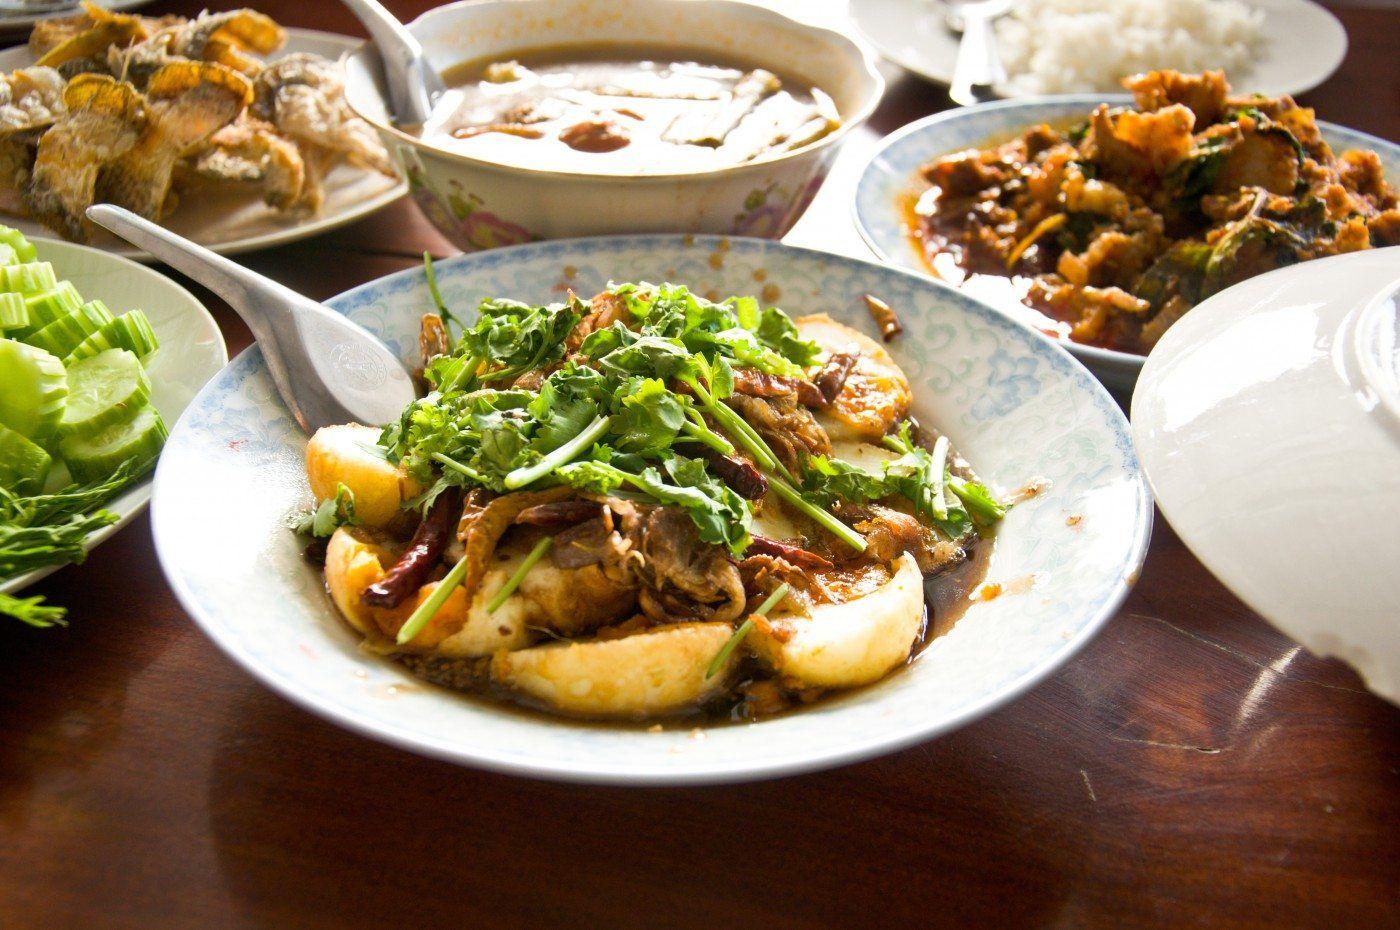 Our guide to milwaukee thai food food thai recipes